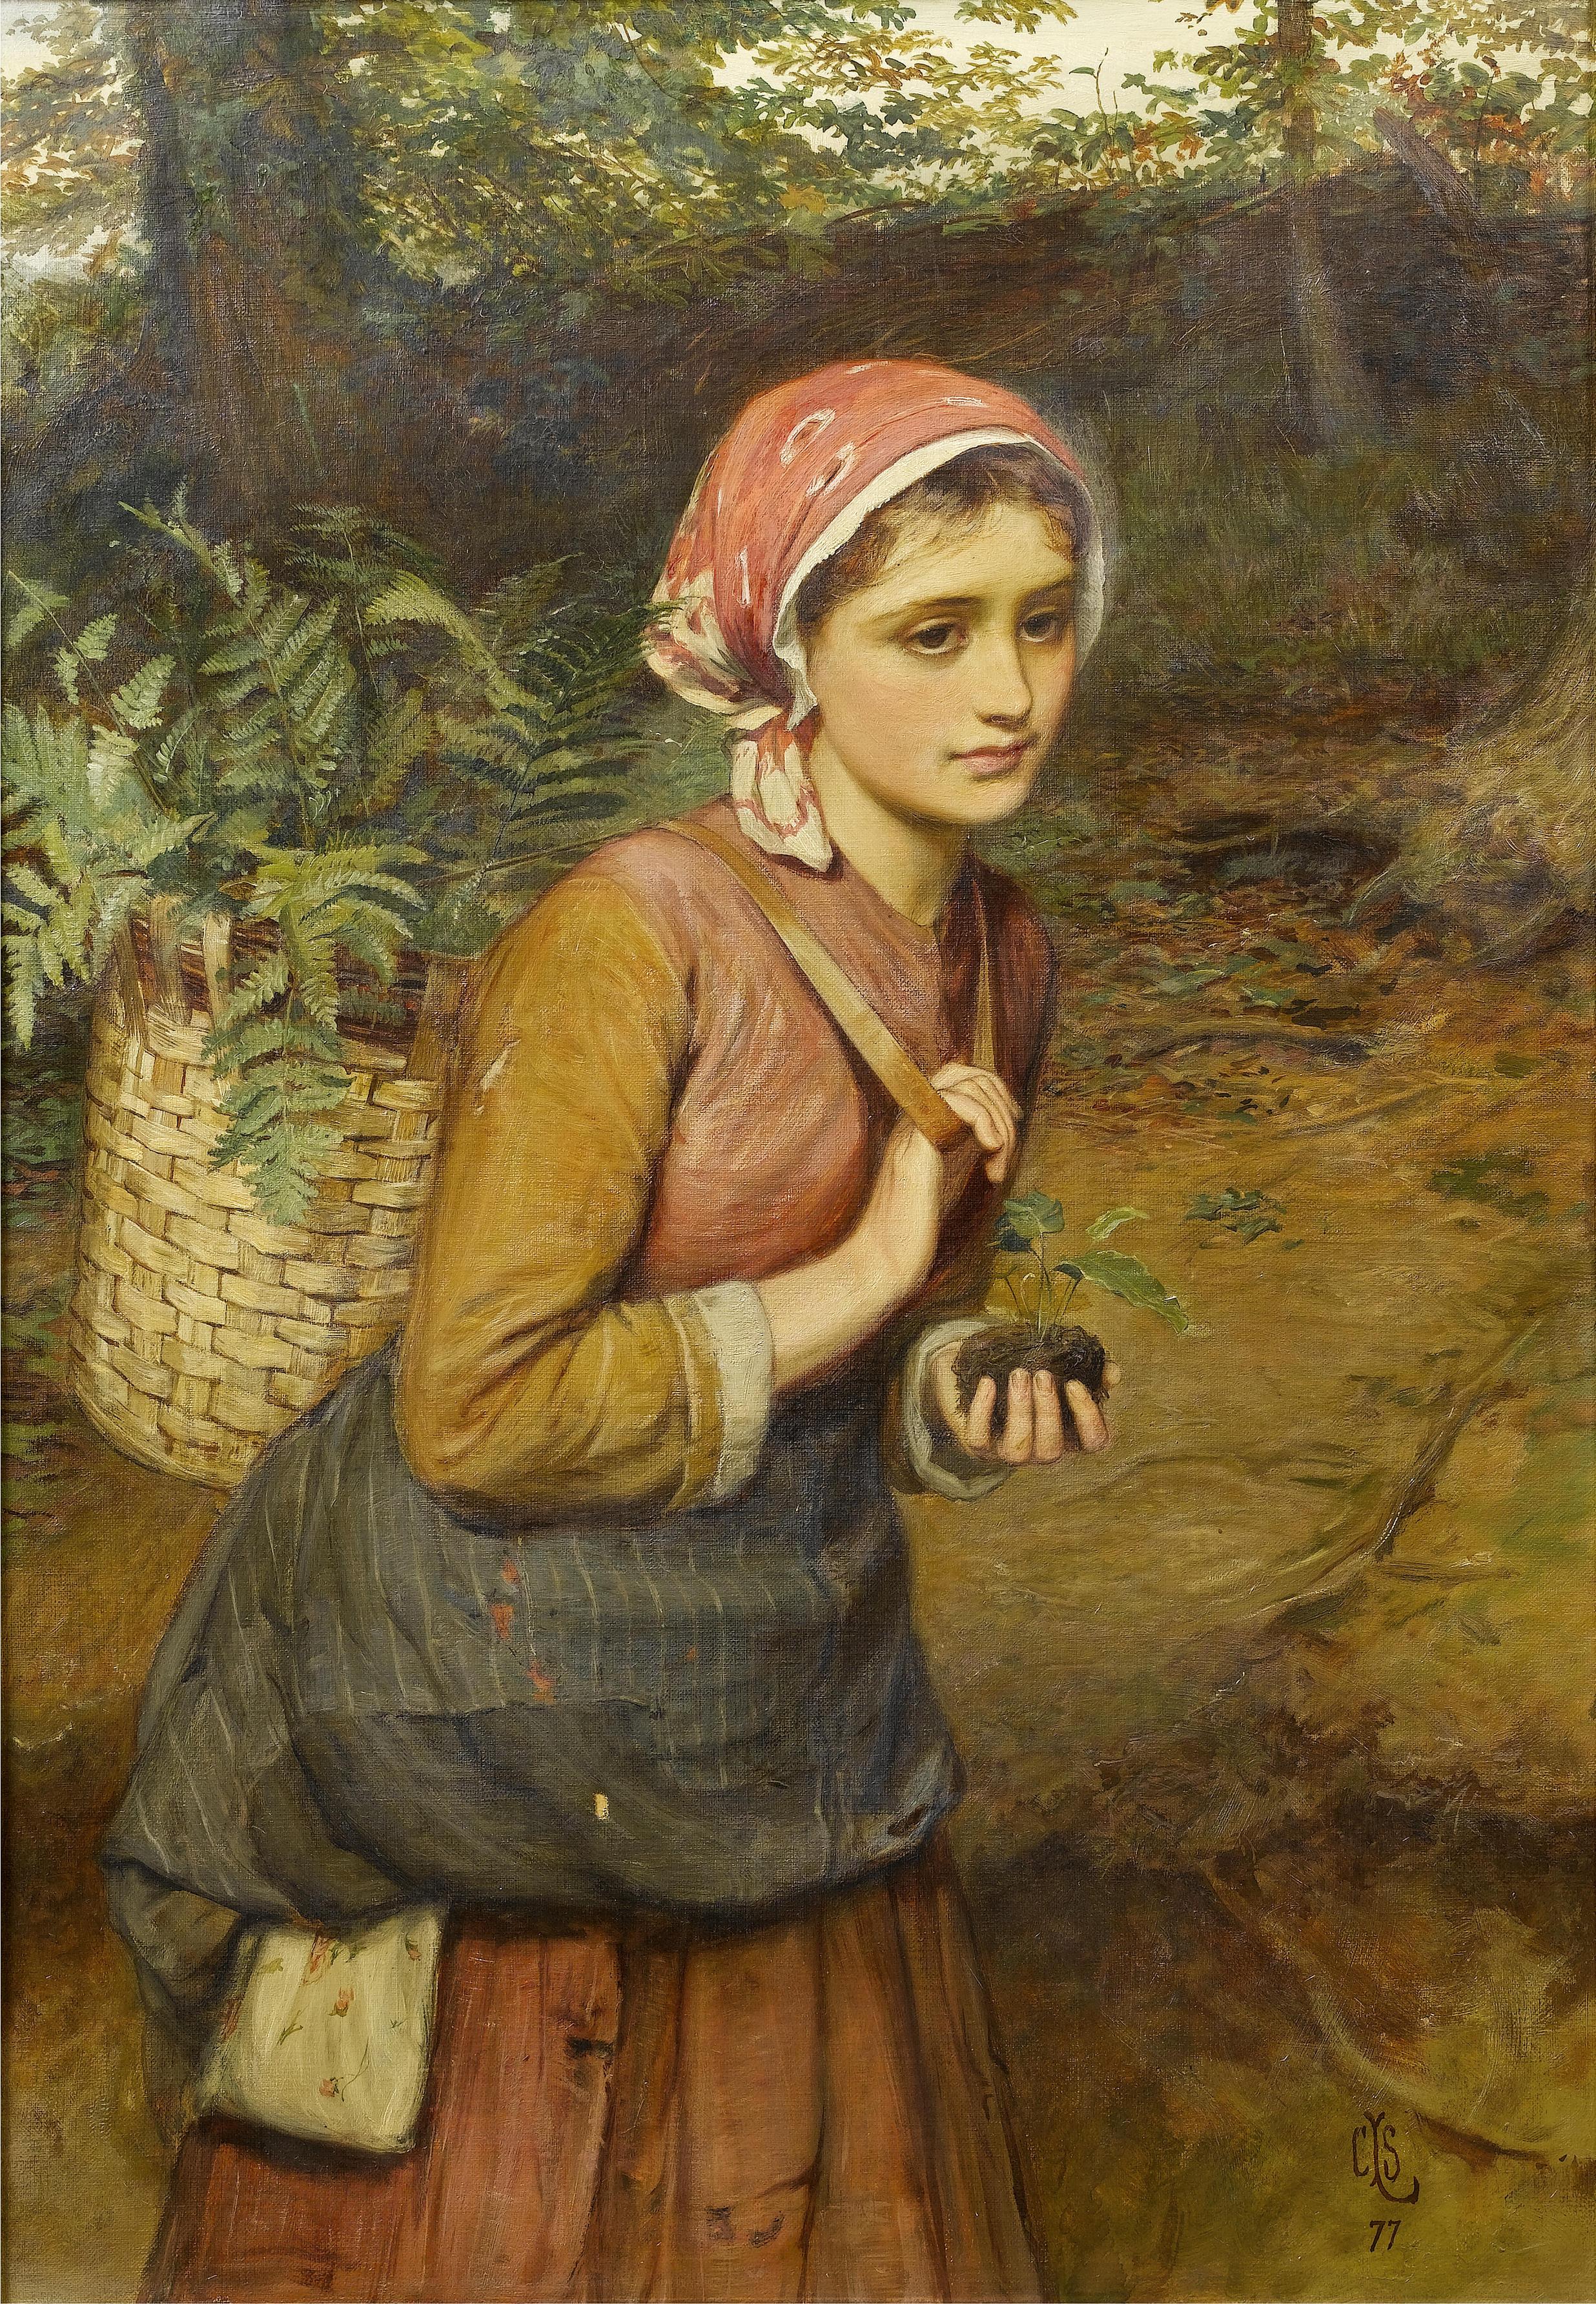 Charles Sillem Lidderdale: The fern gatherer, 1877.